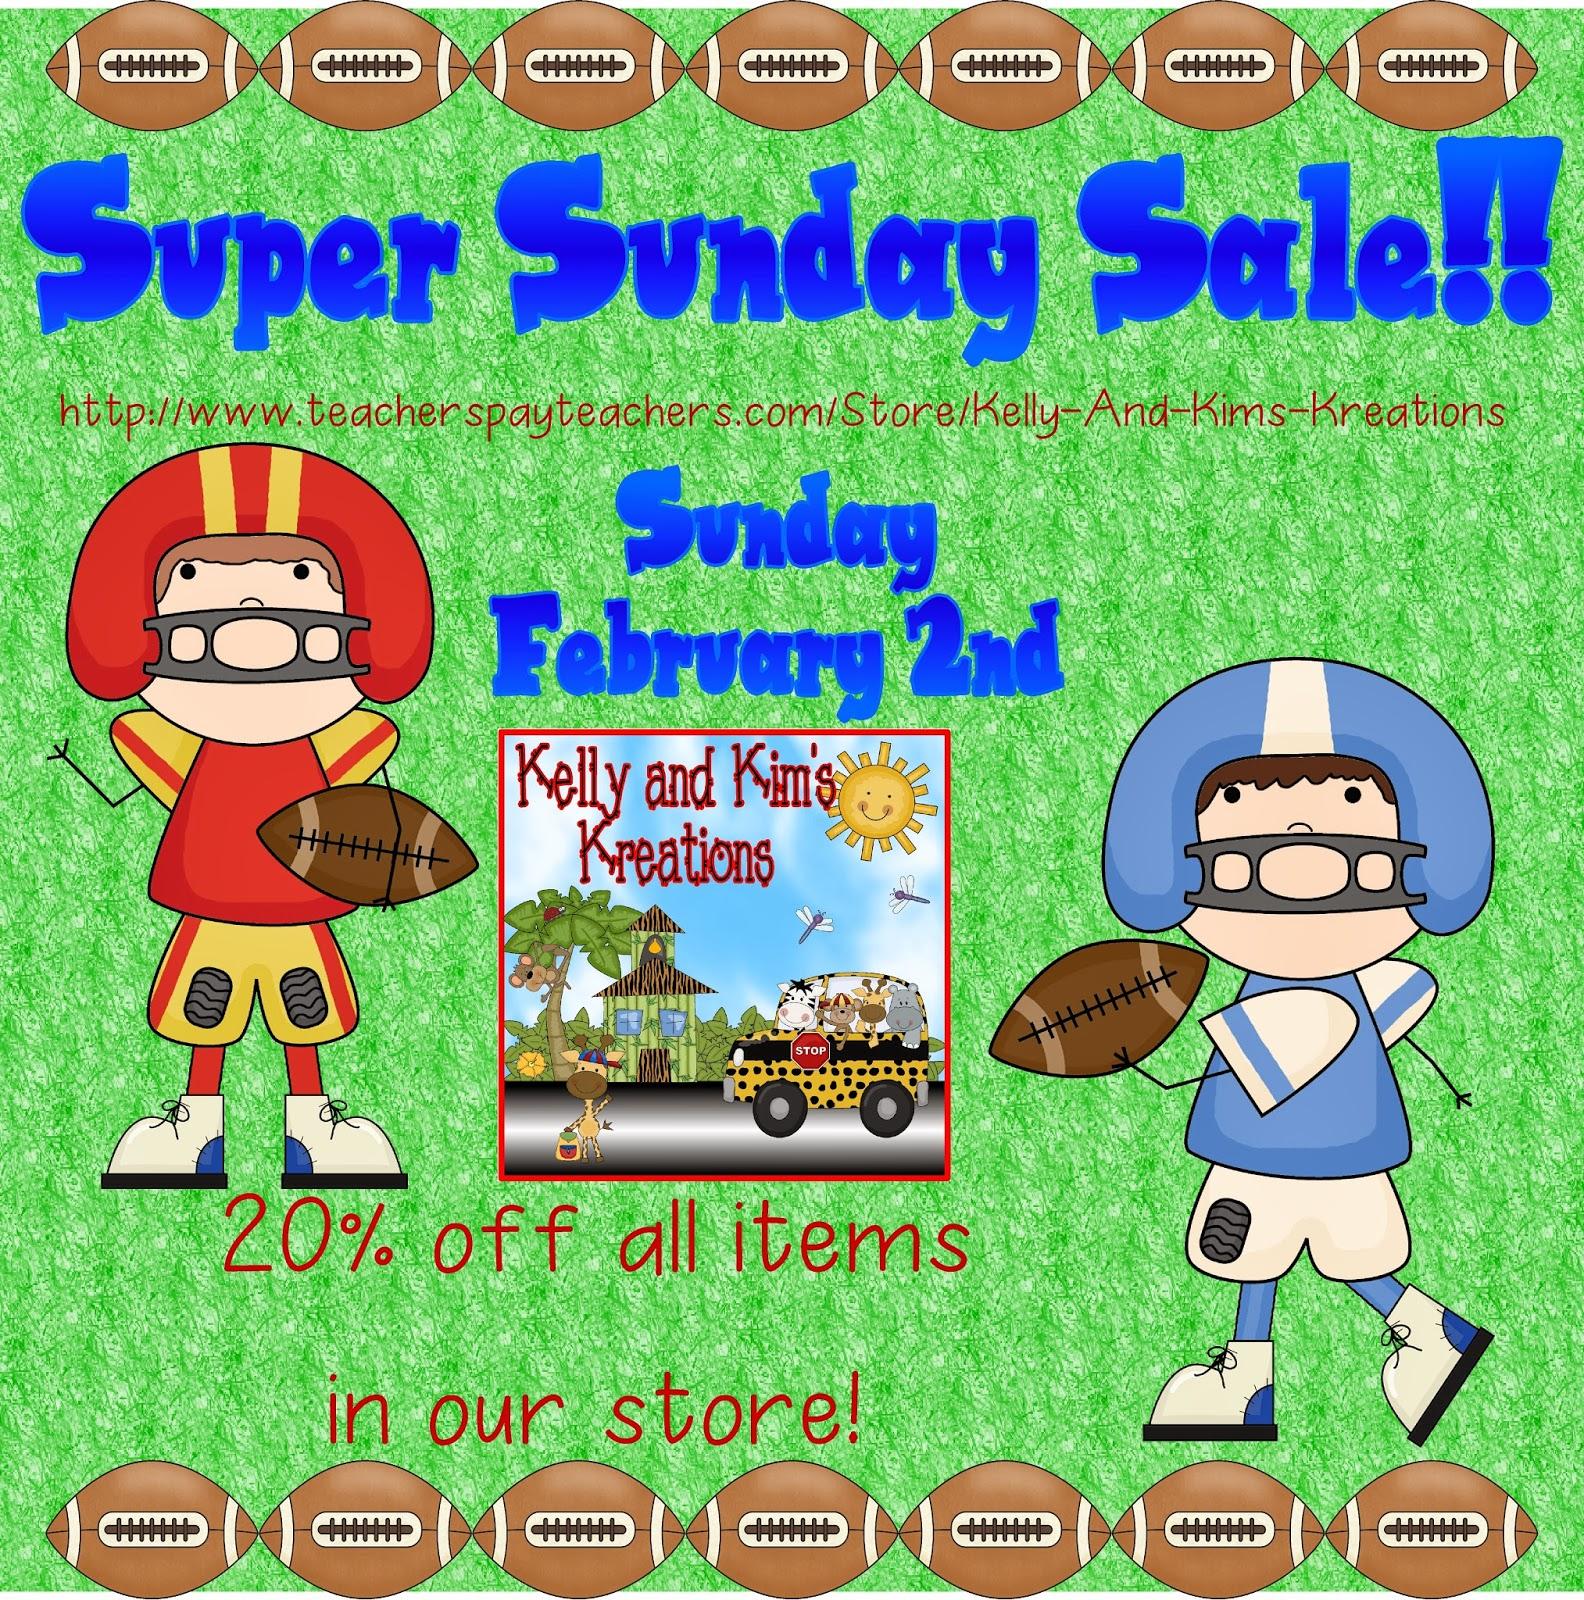 Kelly And Kim S Kindergarten Kreations Super Bowl Sunday